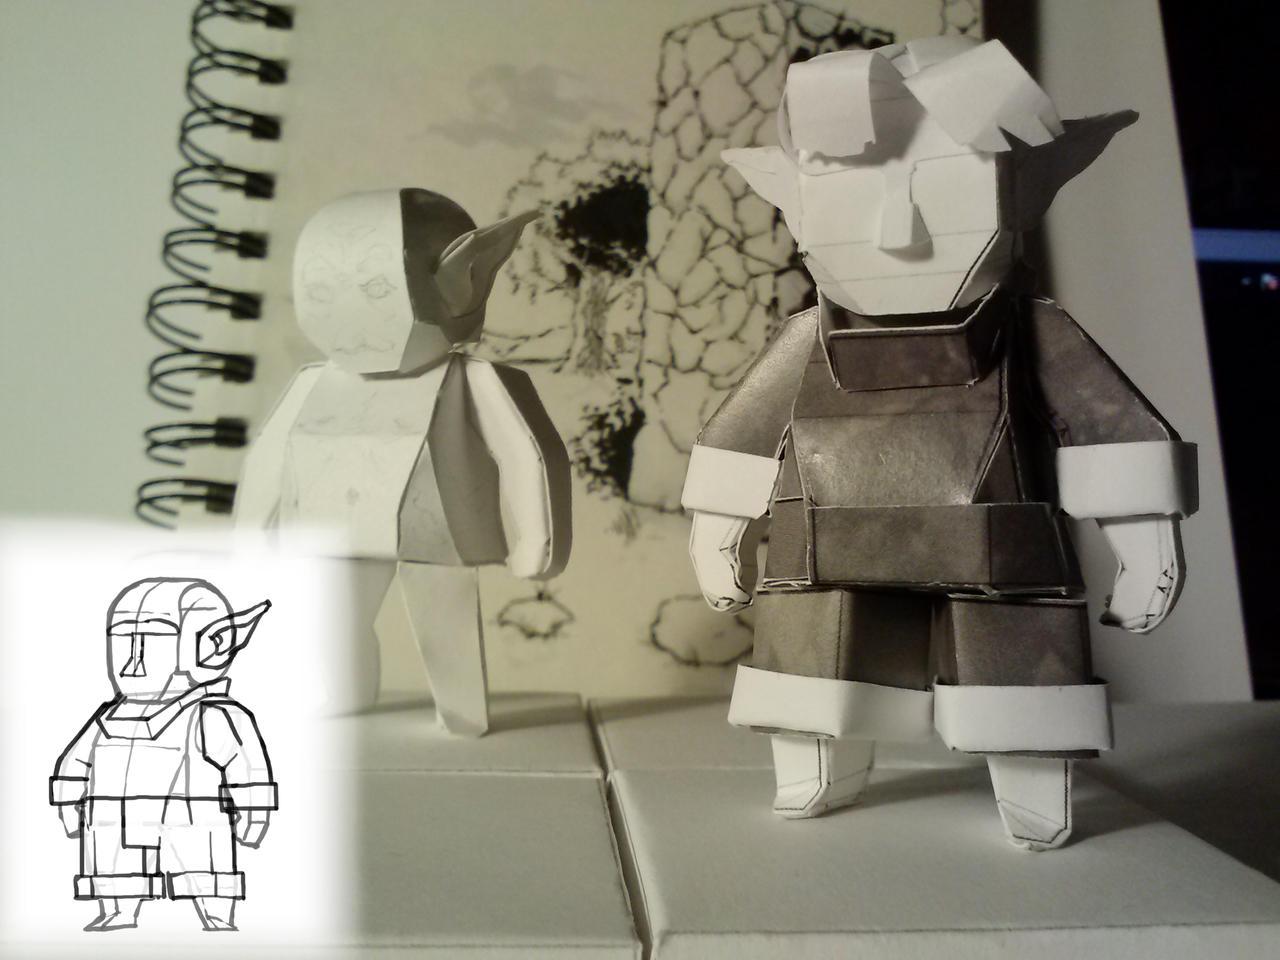 Elf Prototype2 by BCEman